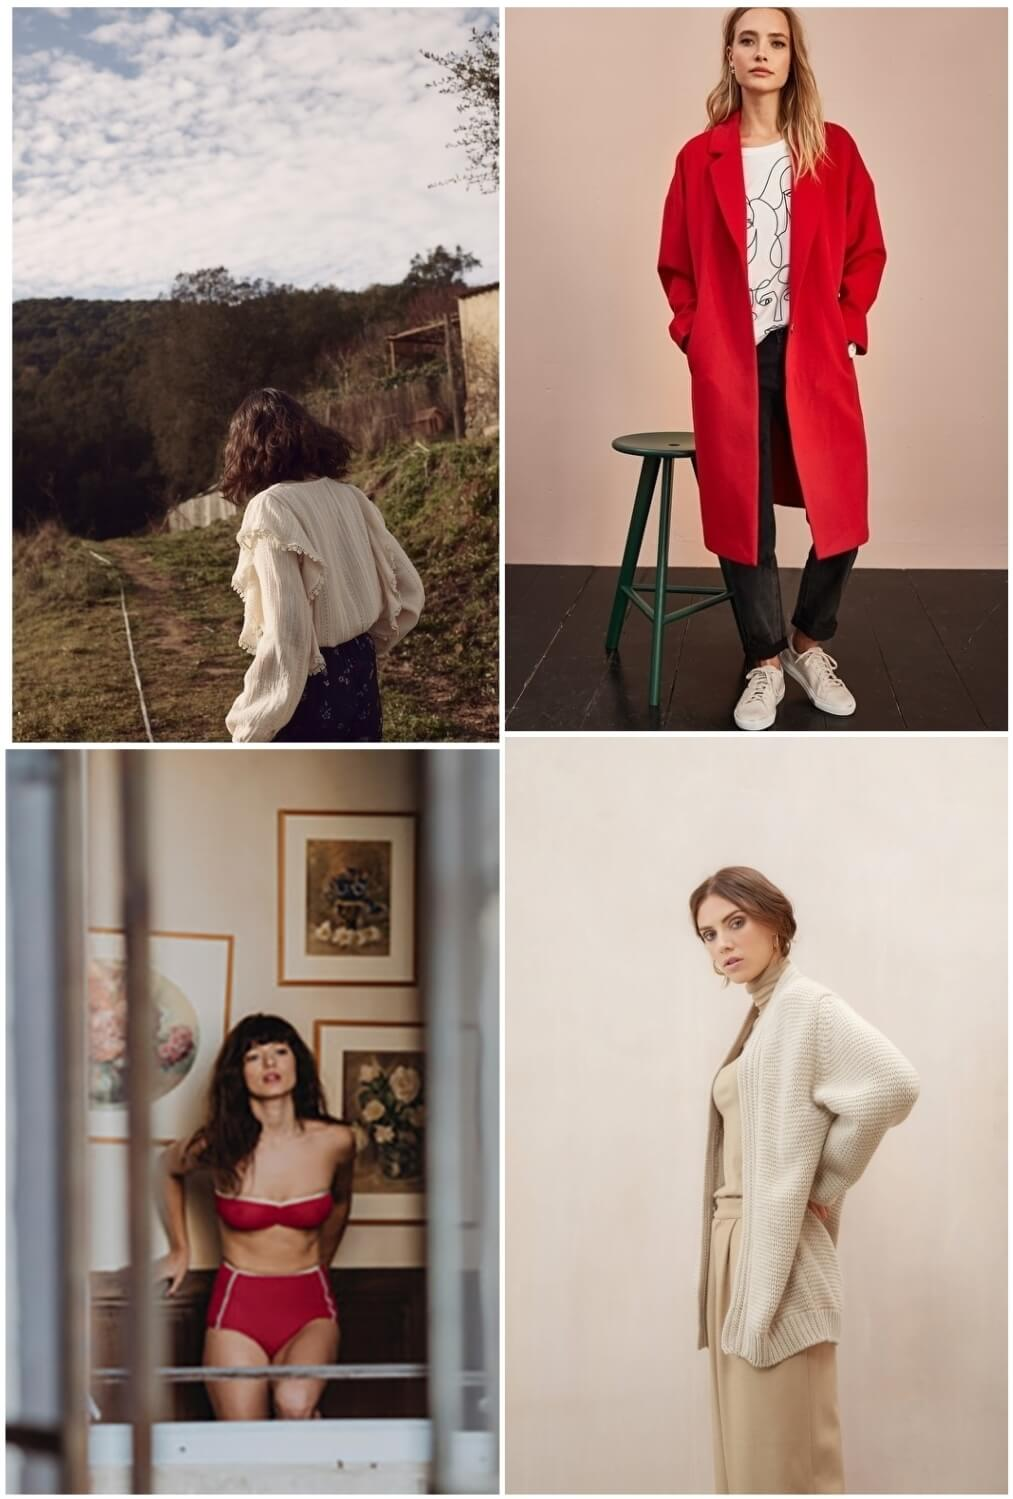 Paul & Paula Cool Autumn styles for mums